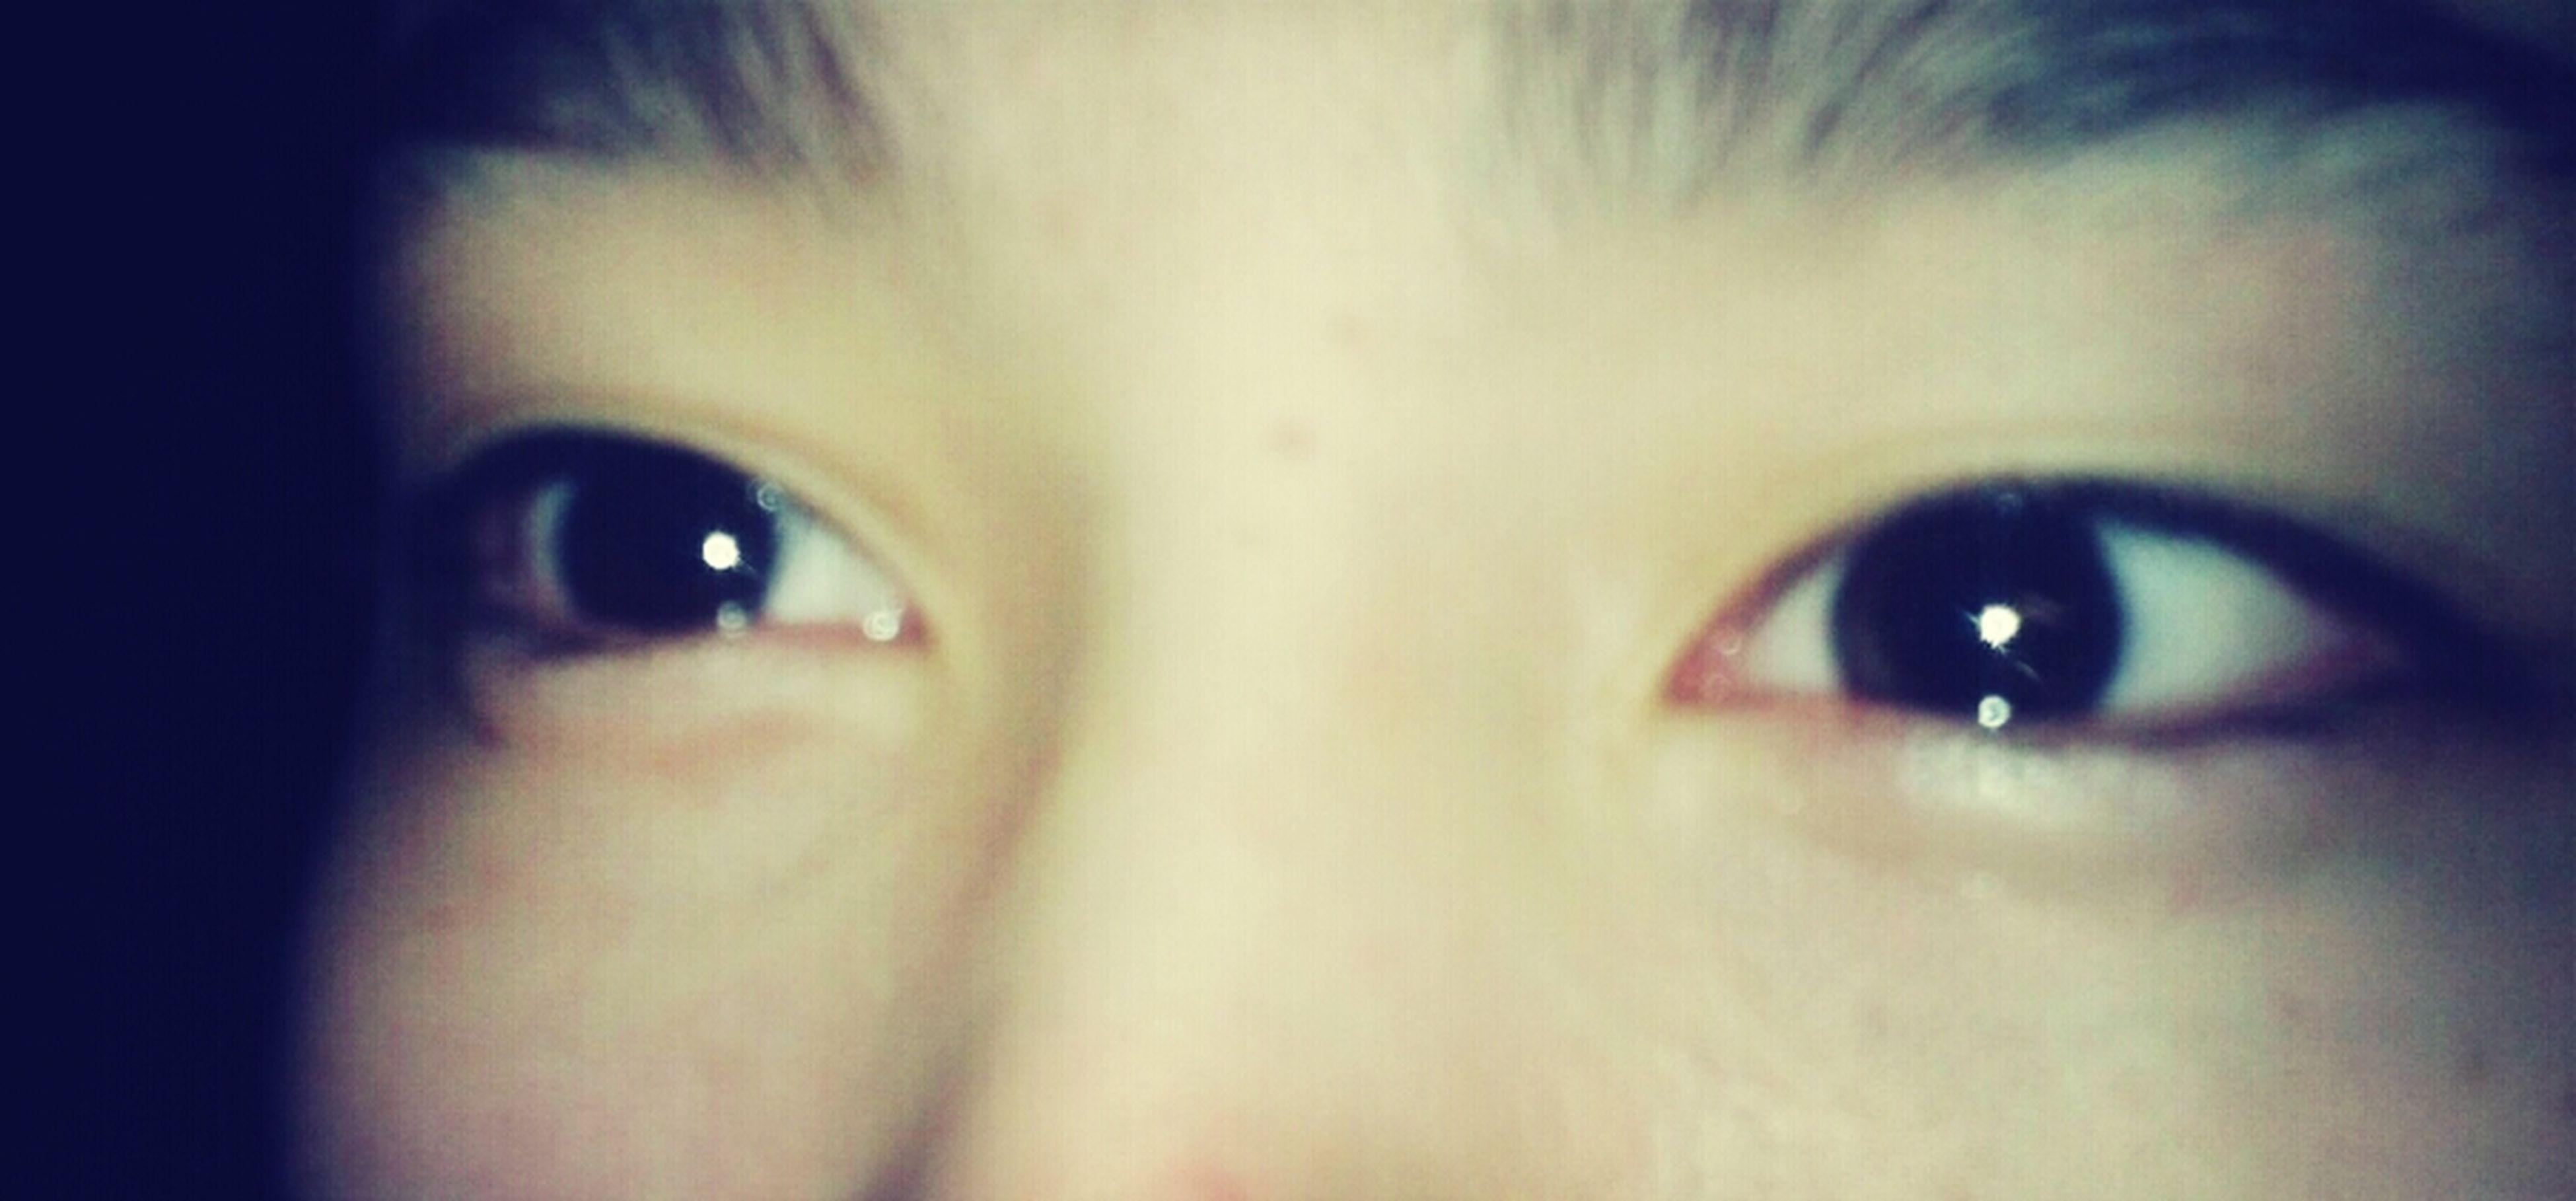 looking at camera, portrait, close-up, headshot, human eye, human face, indoors, blue eyes, eyelash, front view, staring, person, lifestyles, part of, young adult, green eyes, eyesight